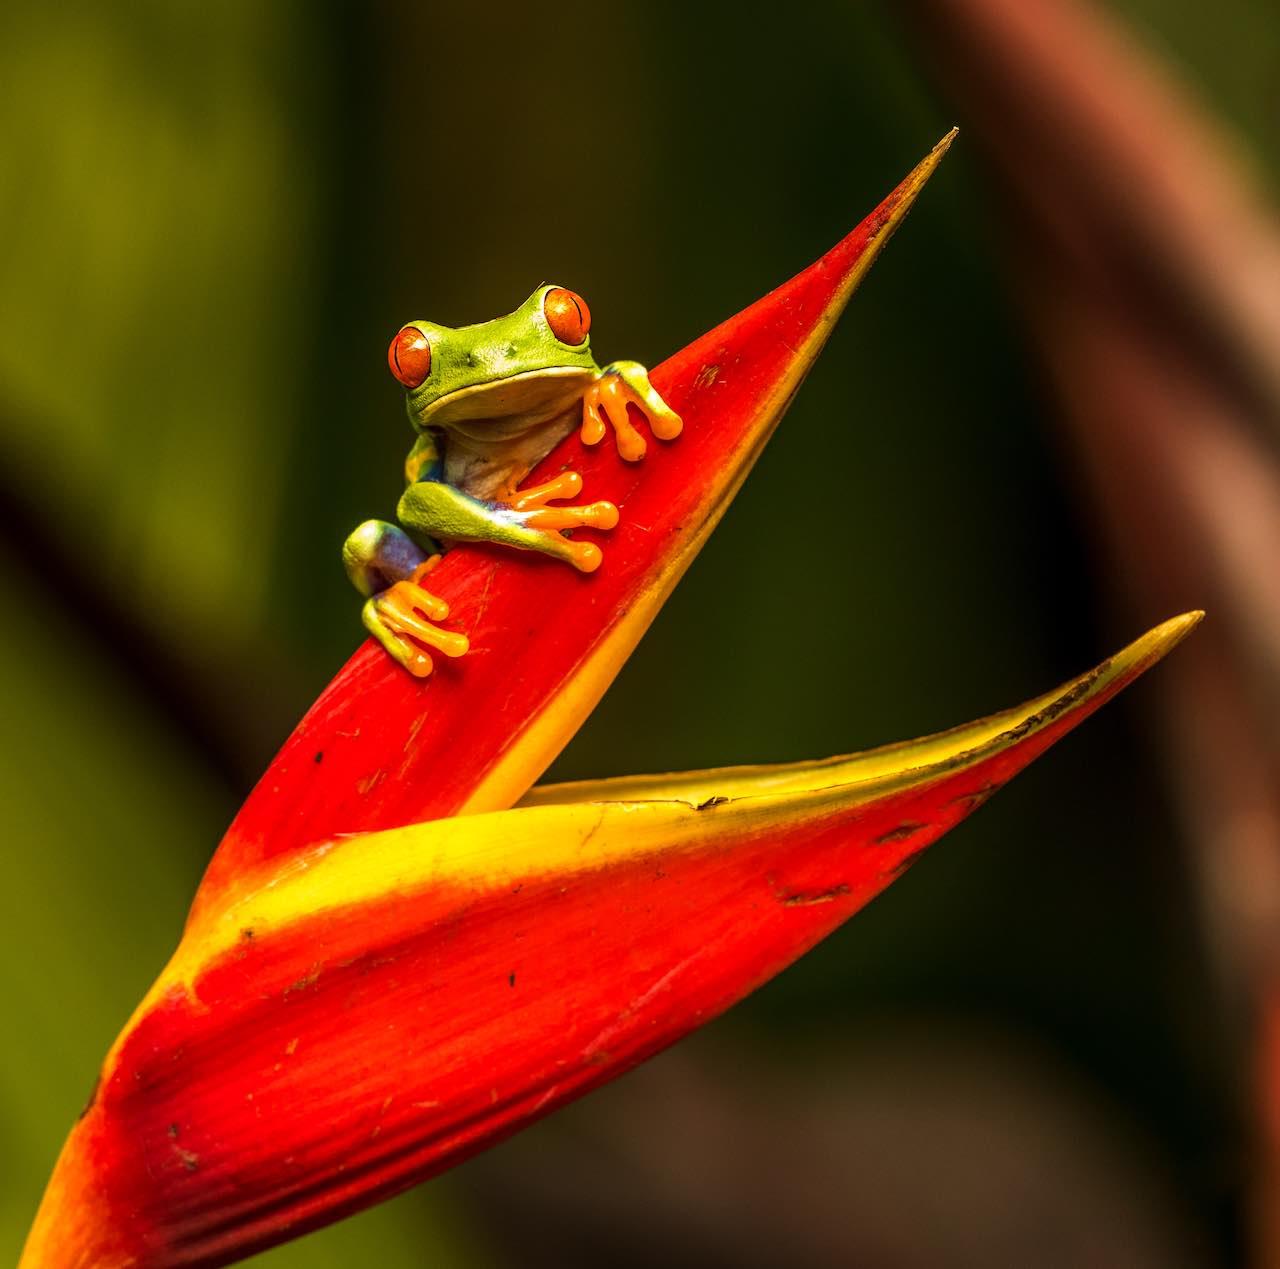 Costa Rica Credit Zdenek Machacek